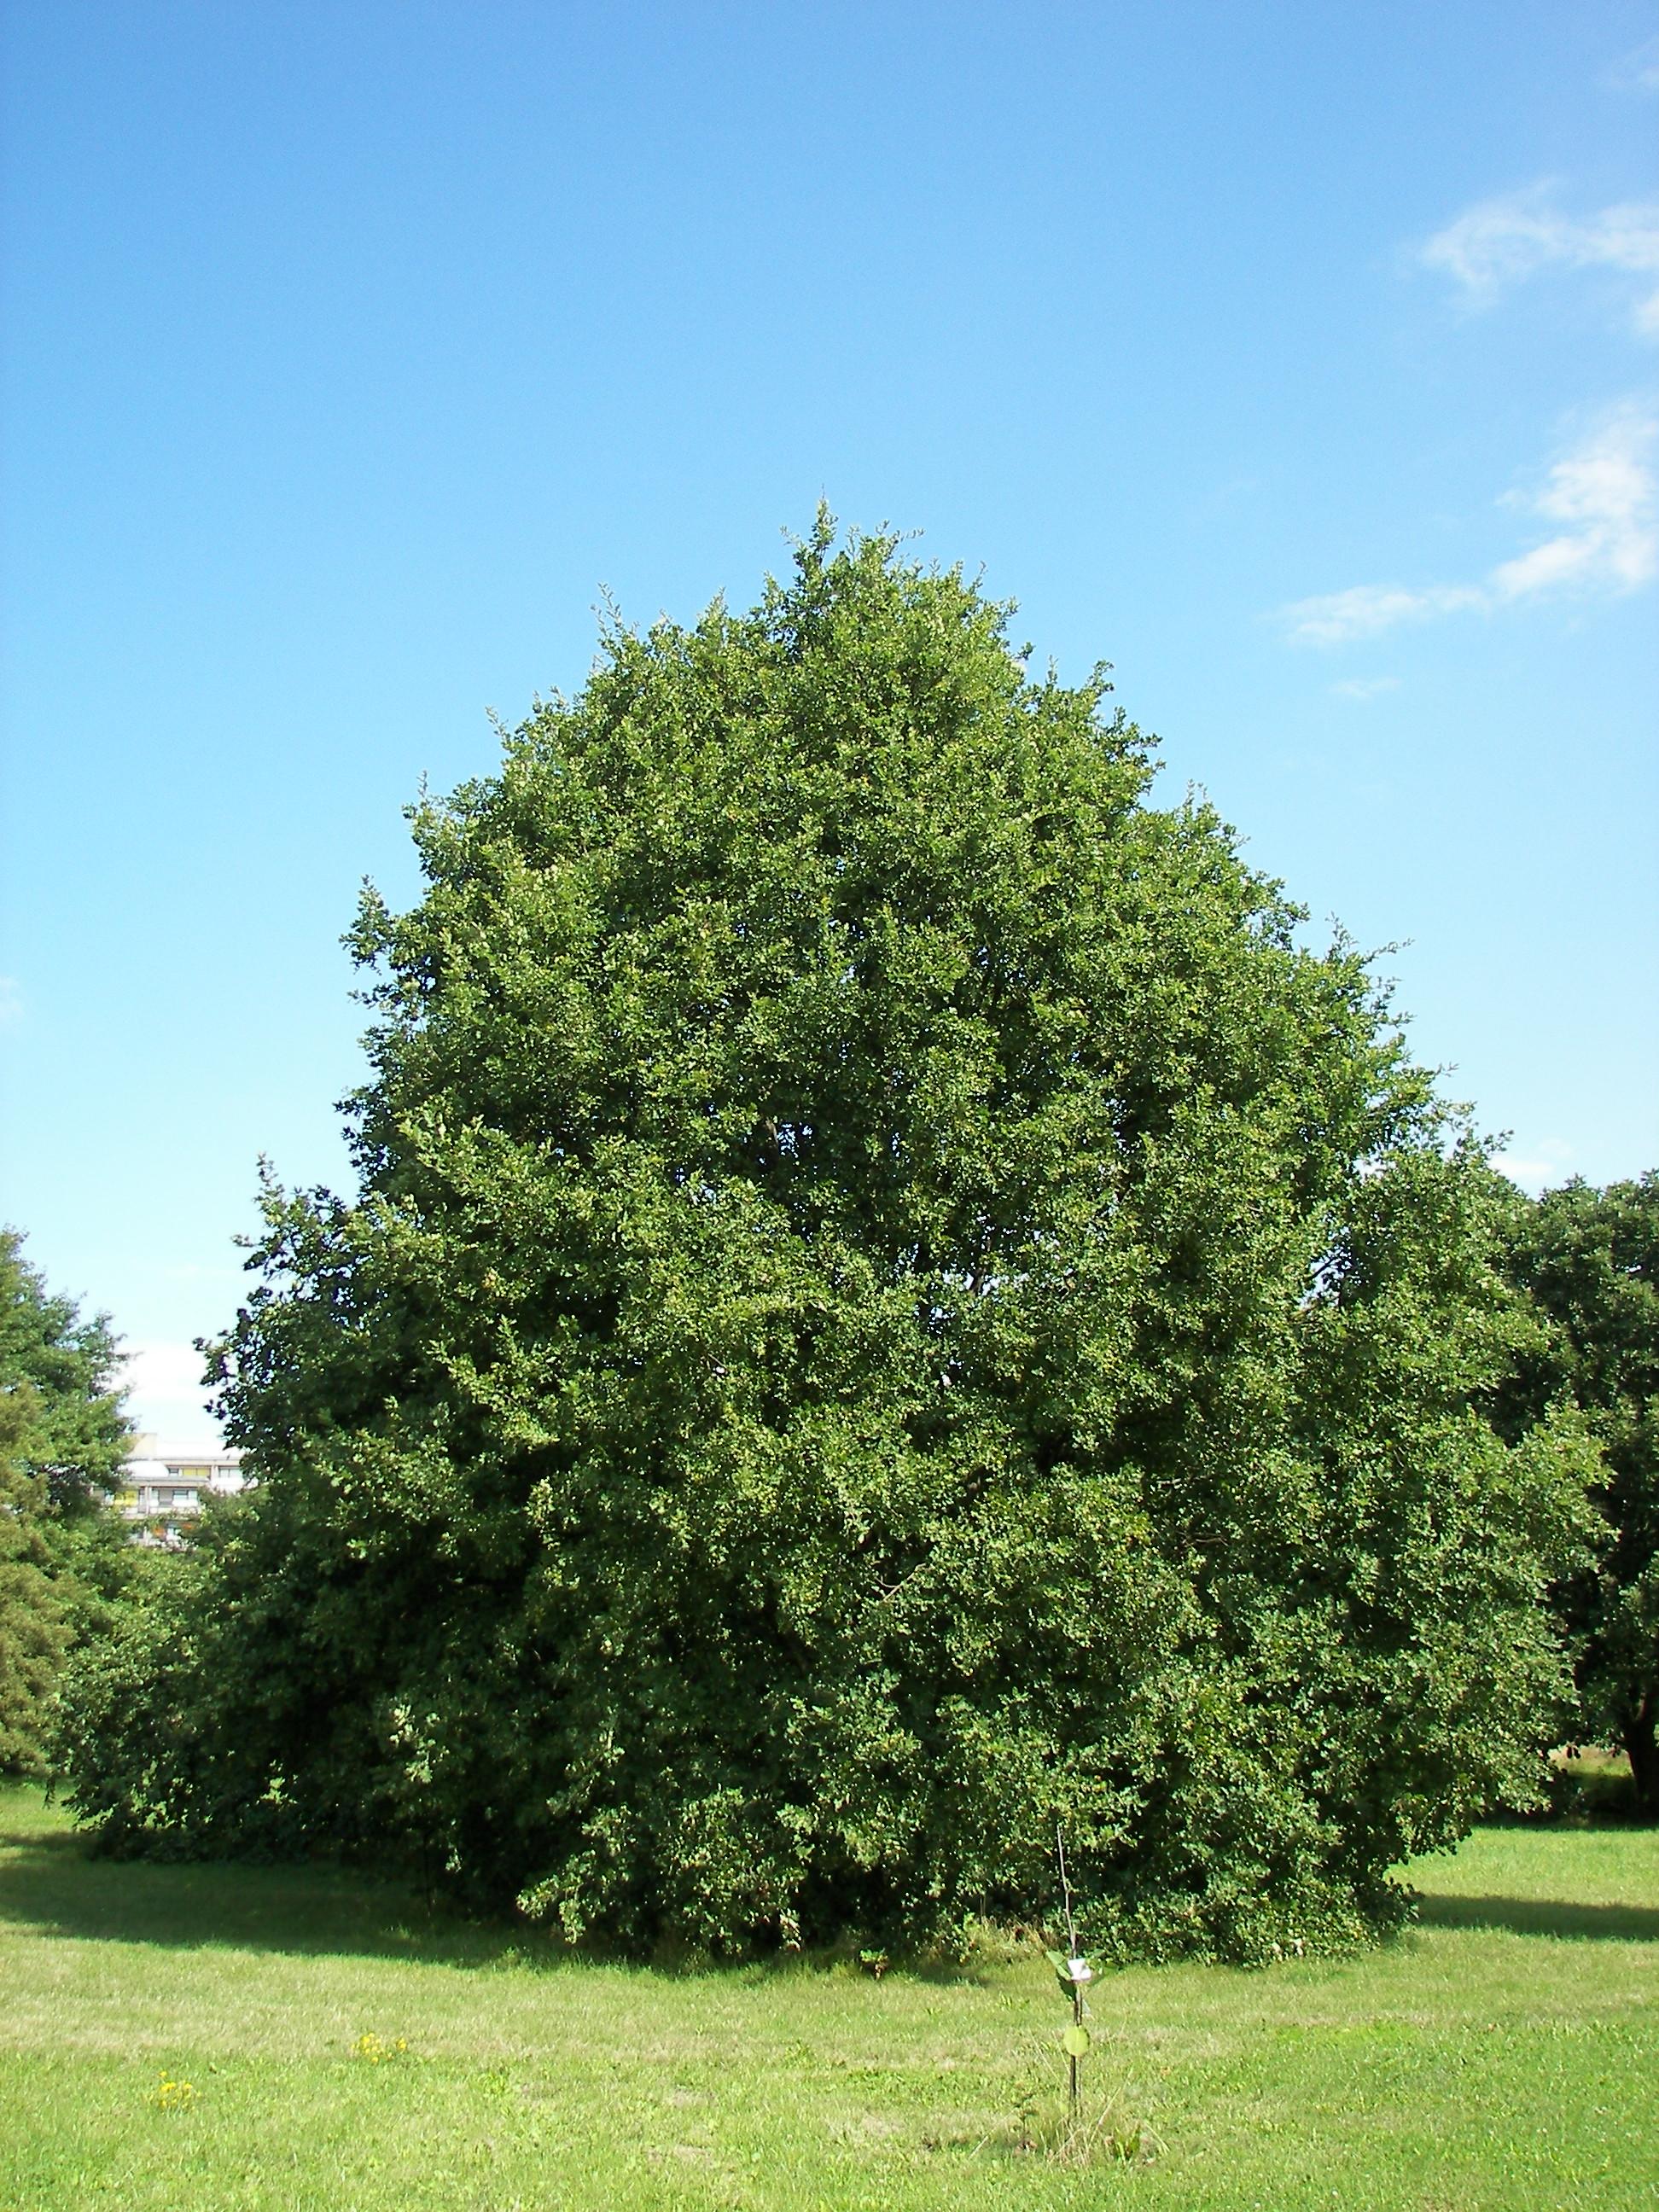 http://upload.wikimedia.org/wikipedia/commons/c/cf/Quercus_petraea_01.jpg